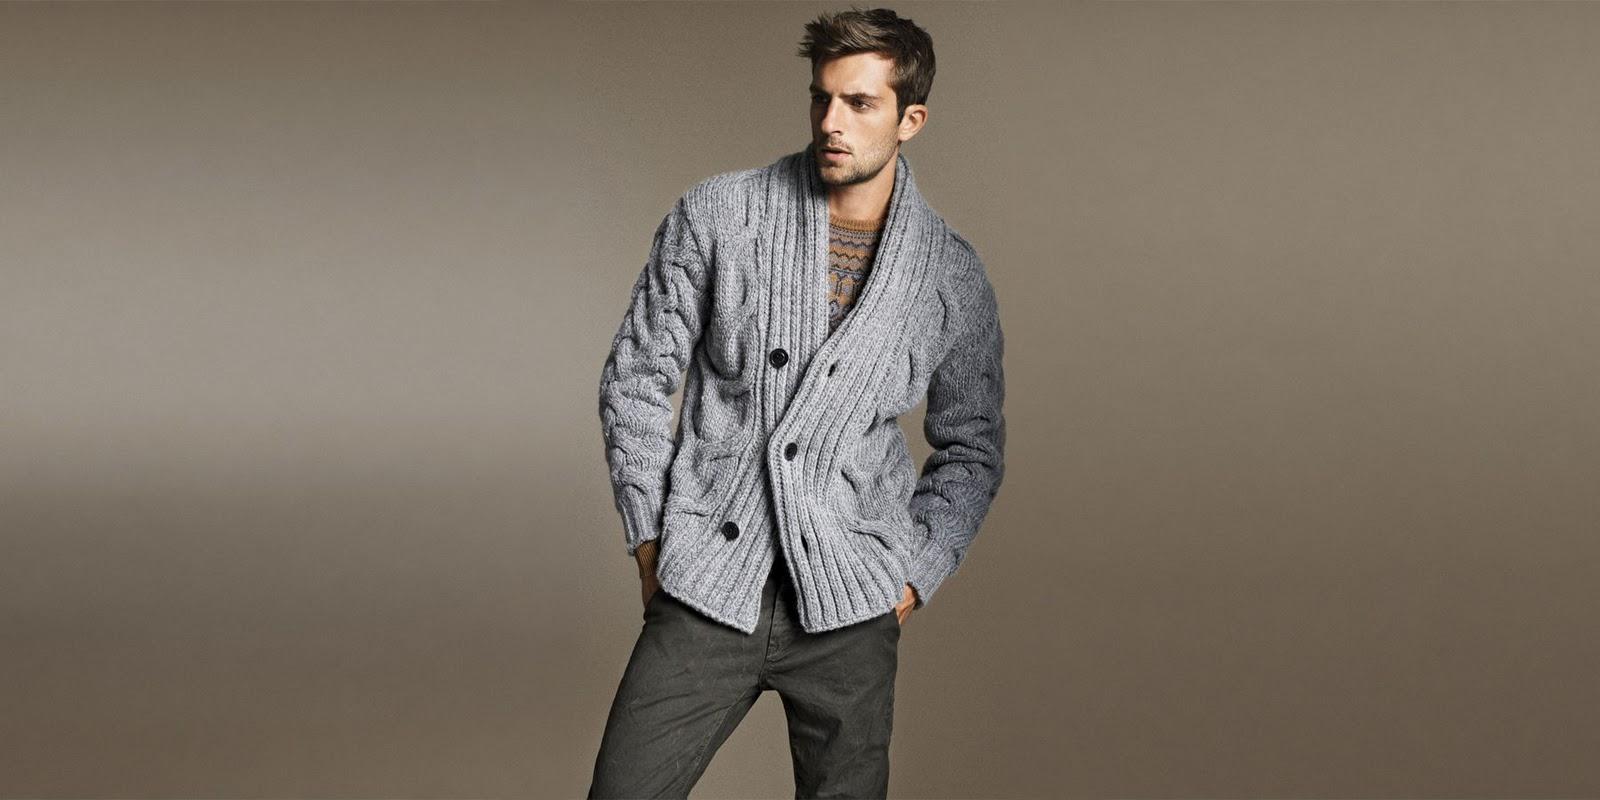 Mode, Beauté, Joaillerie, Défilés,fashion shopping: ZARA ...